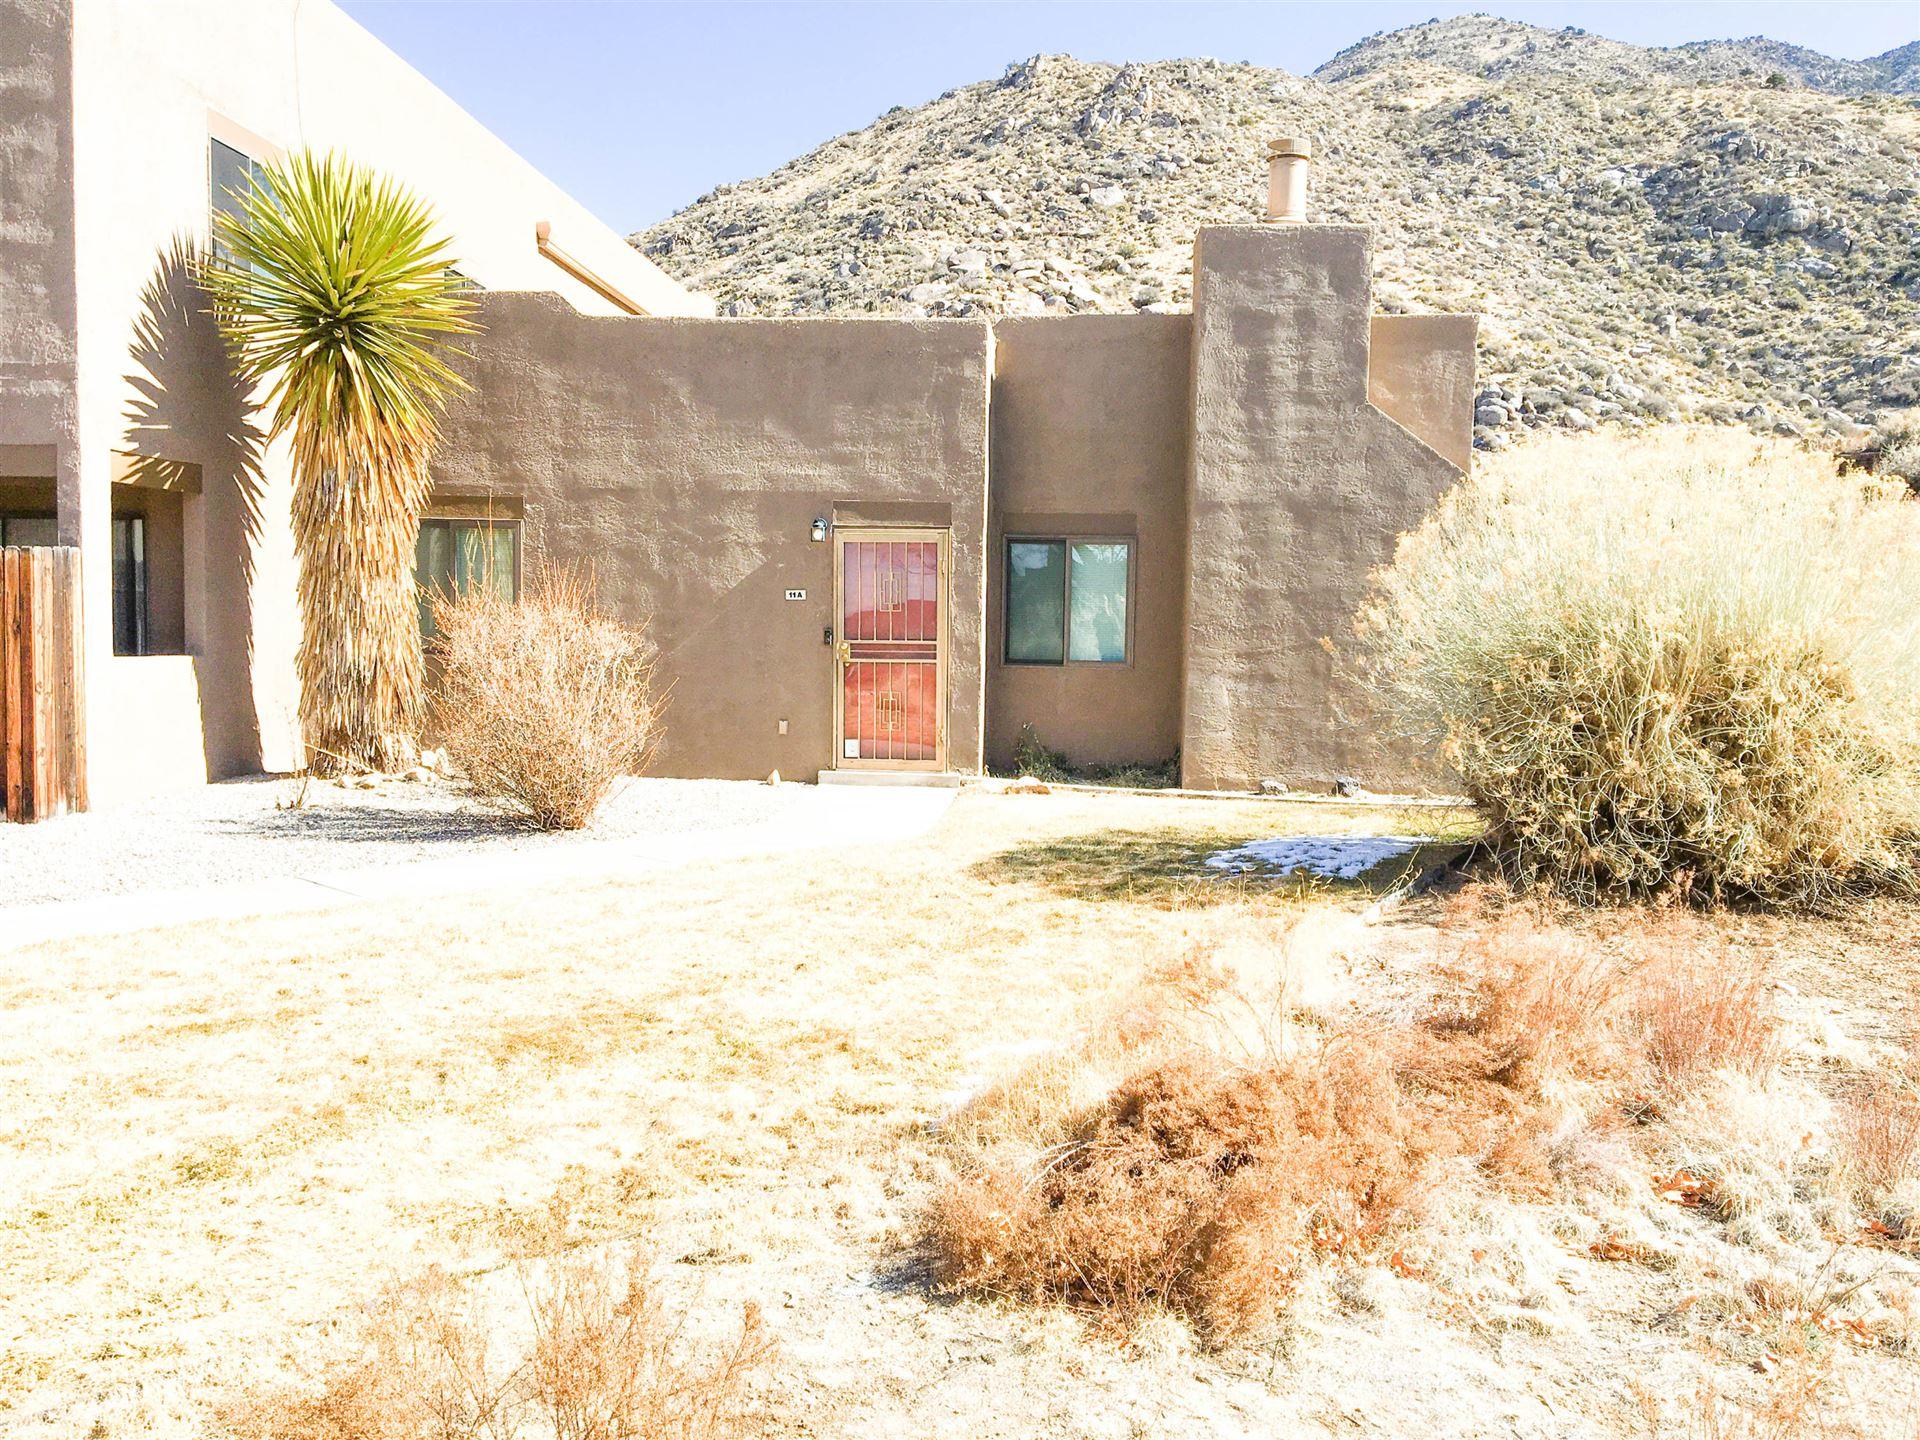 2900 Vista Del Rey NE #11-A, Albuquerque, NM 87112 - MLS#: 986253